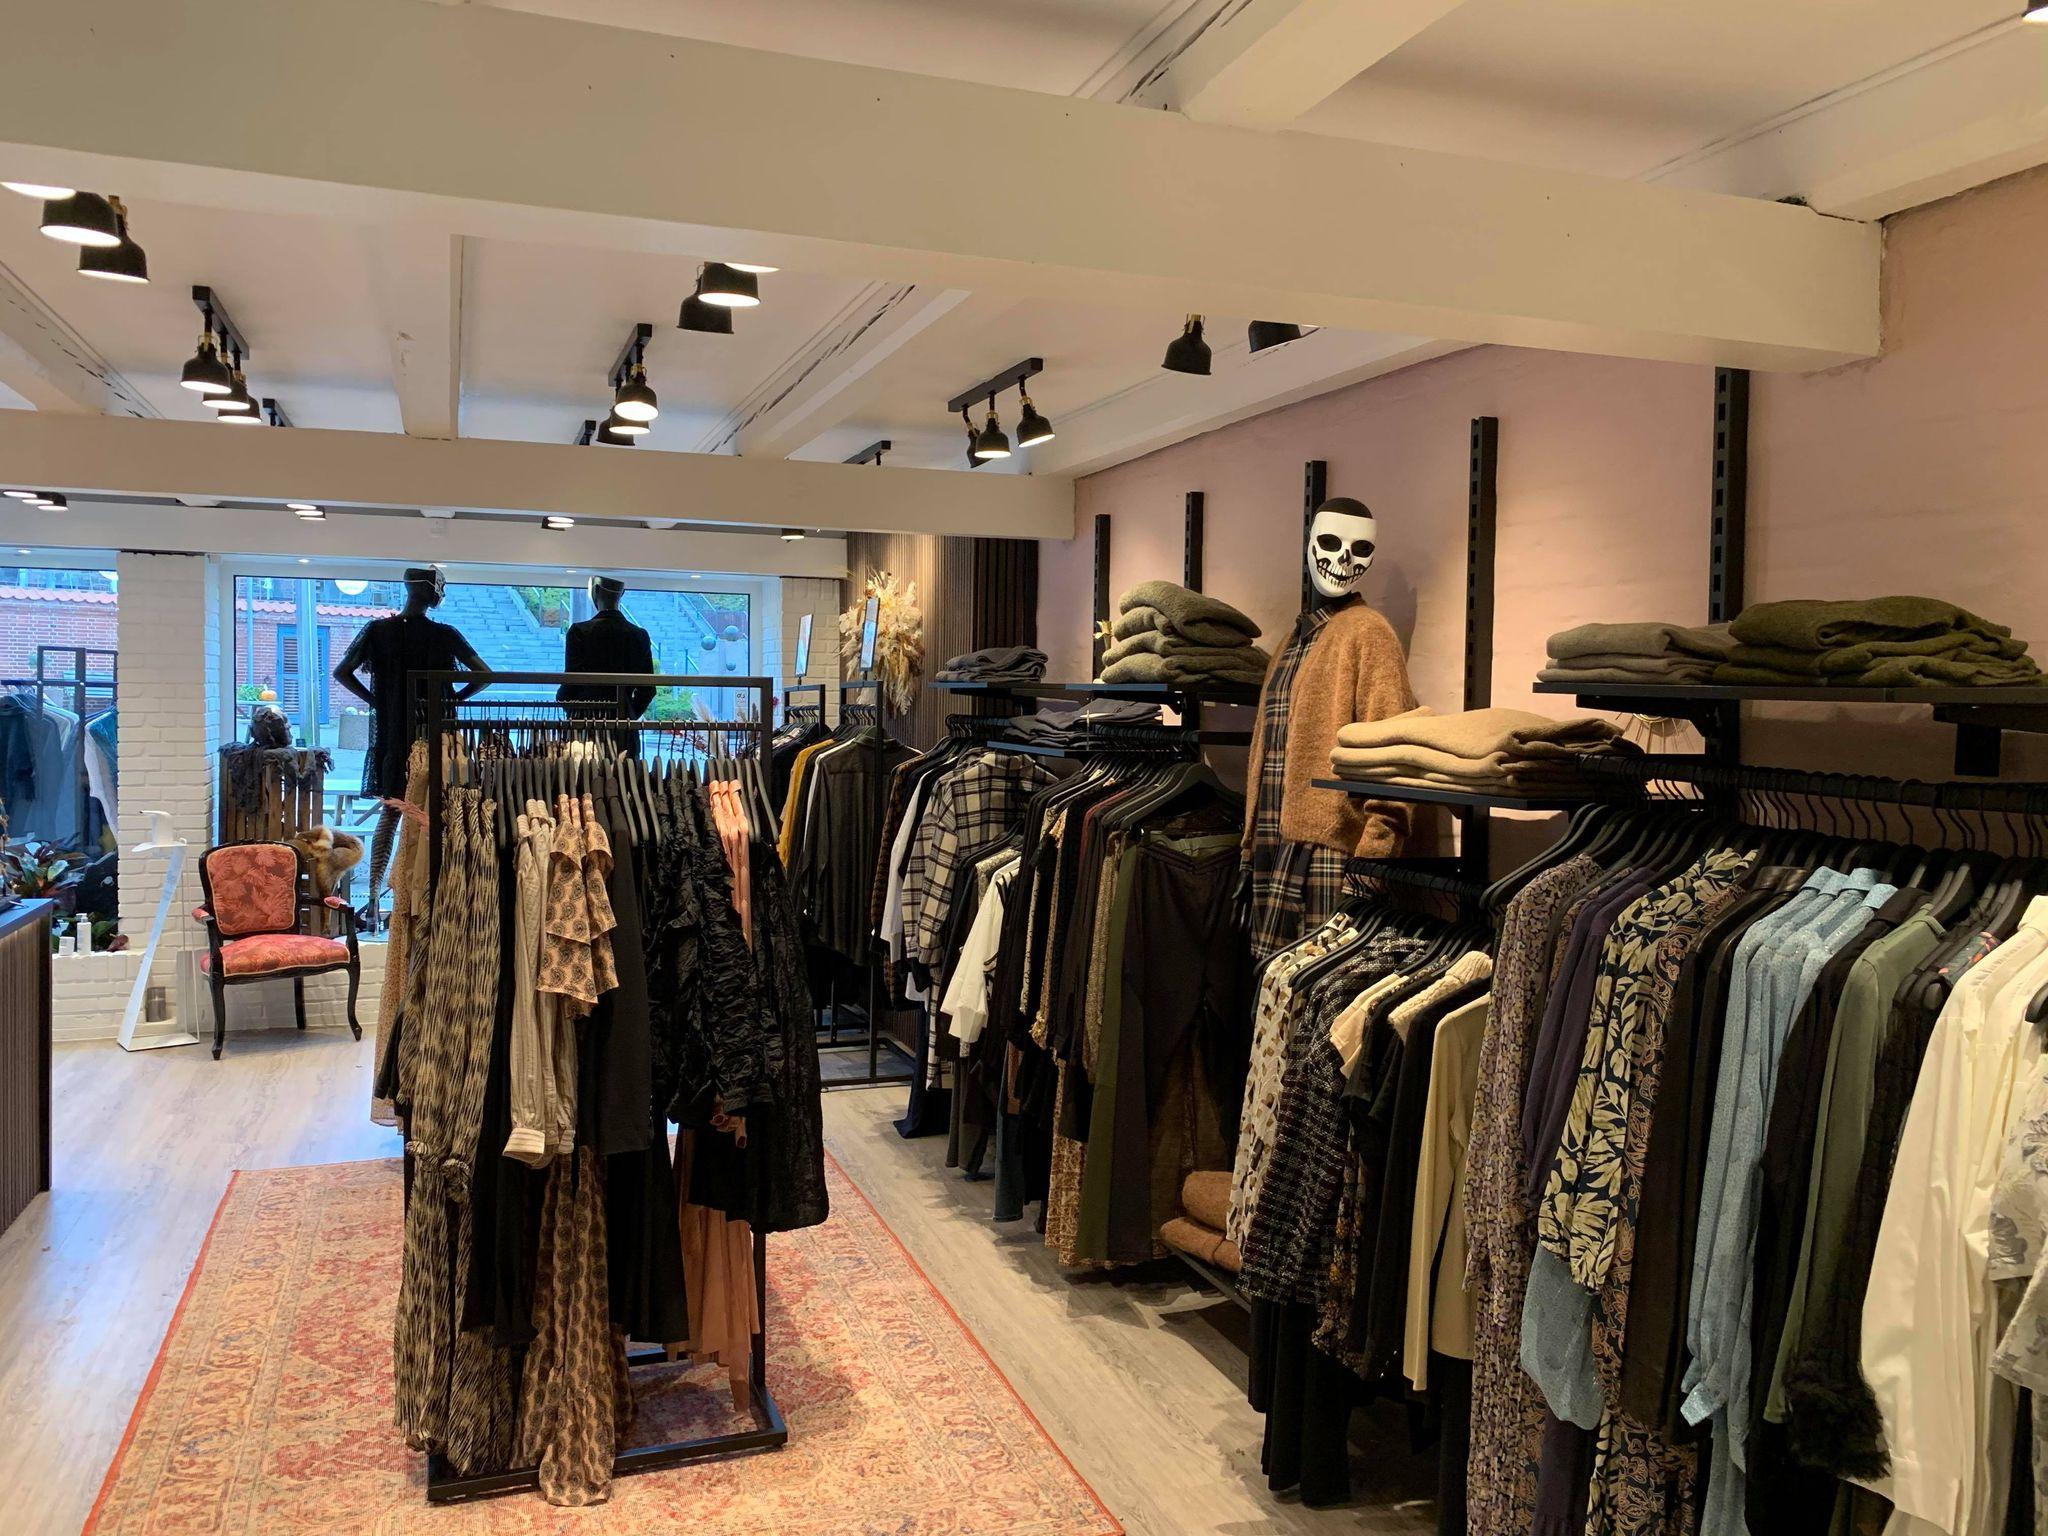 Butiksinventar i lække butik